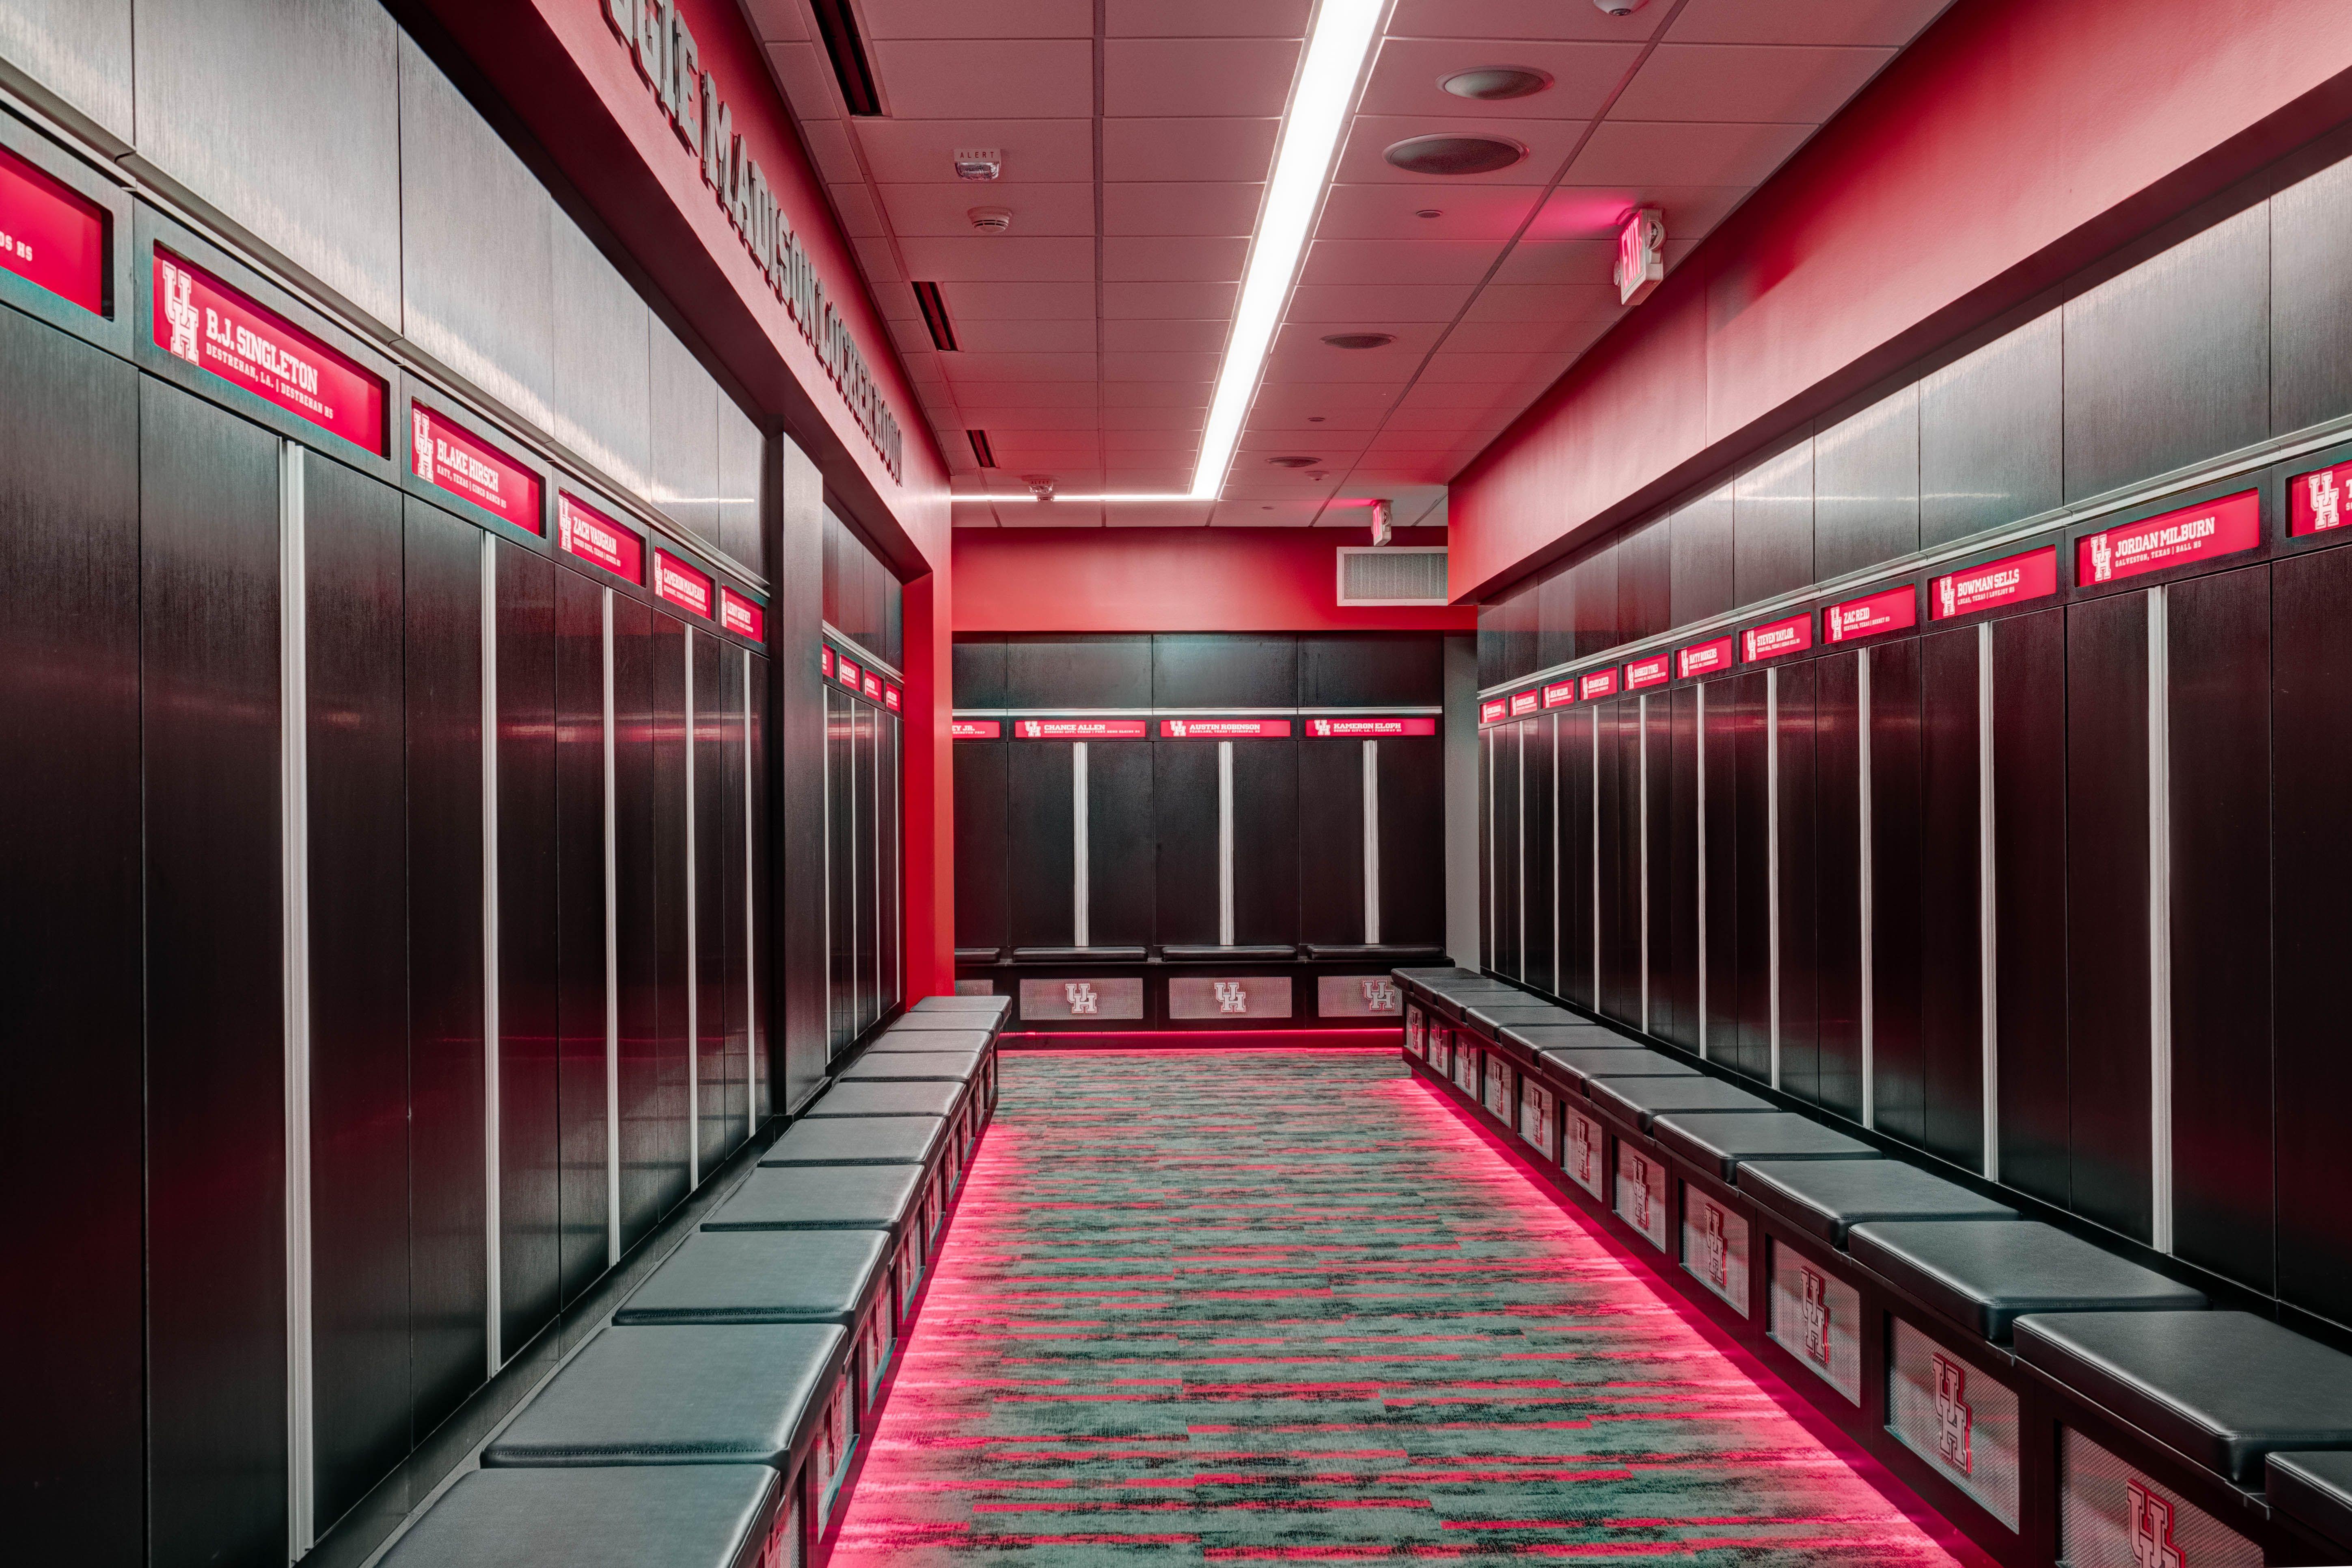 Http Www Uh Edu Facilities Planning Construction News Events Stories 2017 Football Locker Room Jpg Locker Room Lockers Beautiful Interiors